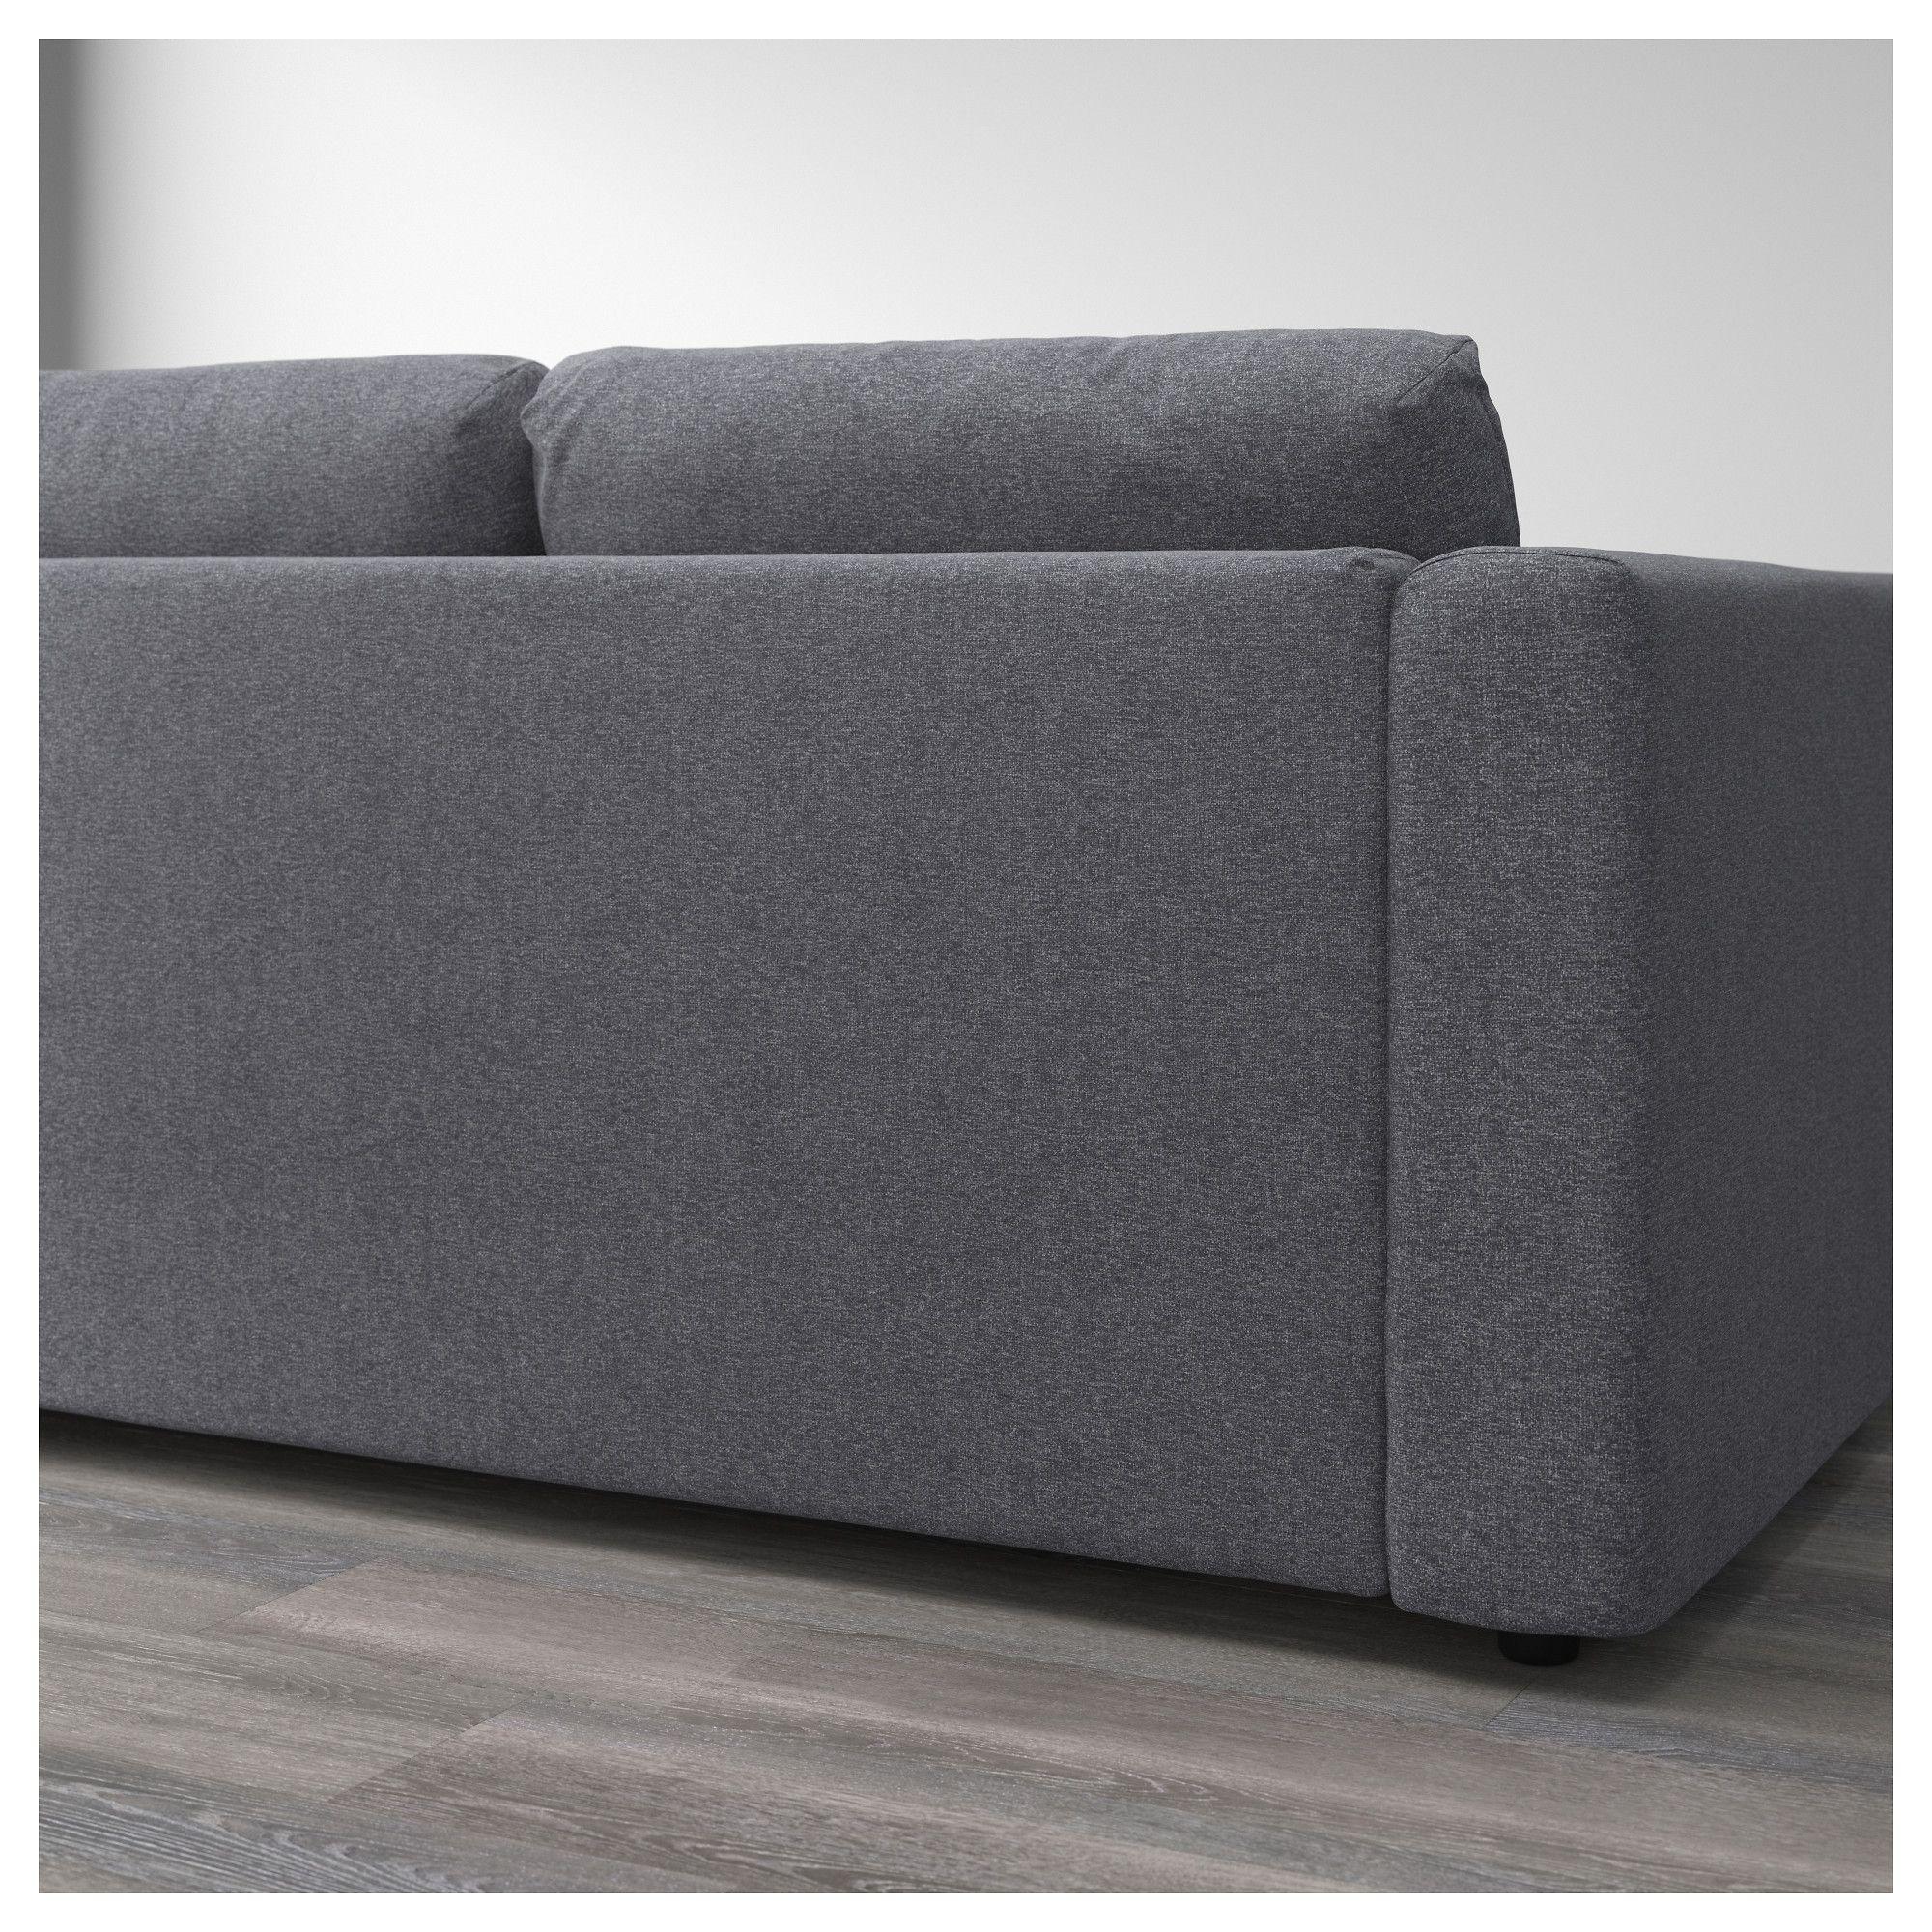 Divano Velluto Blu Ikea furniture and home furnishings | ikea vimle, cozy sofa, ikea